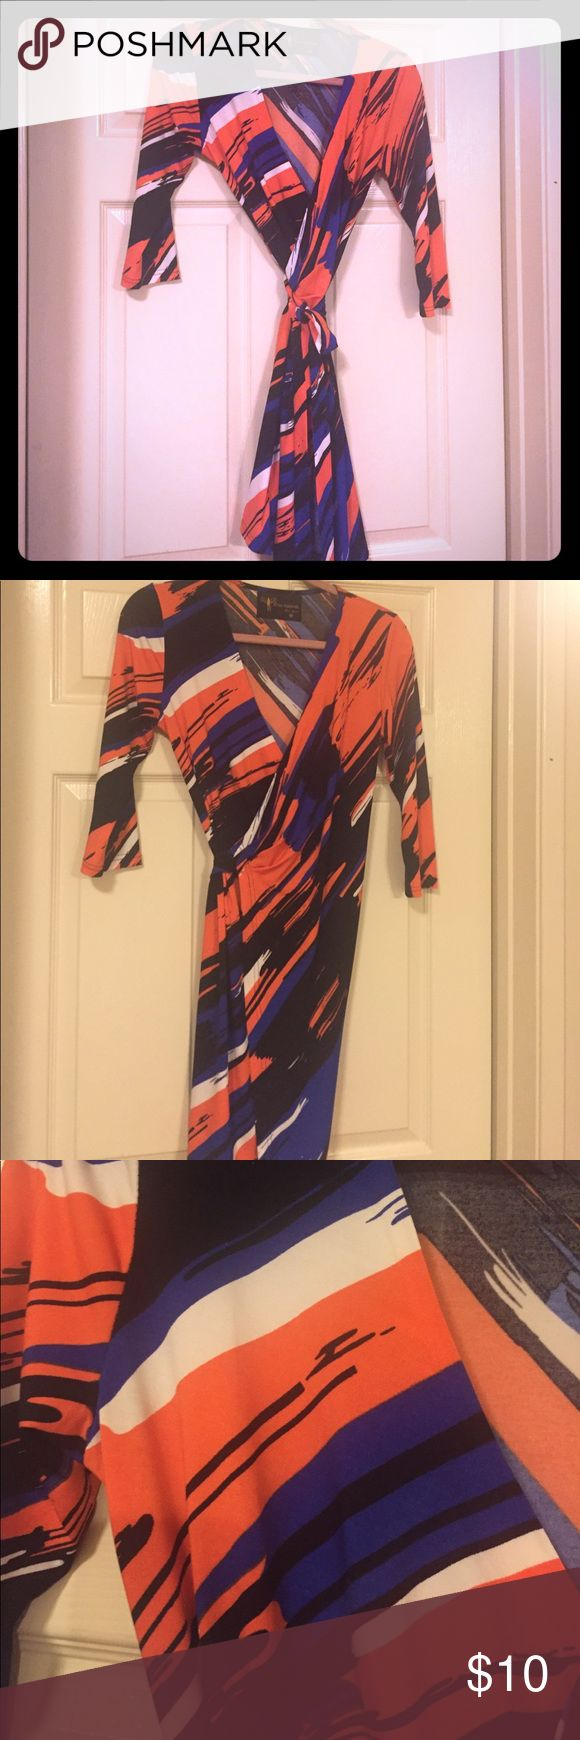 Denver Broncos colors - wrap dress Wrap dress.  Size Medium.  Denver Broncos colors which I took advantage of during the season. Great condition Dresses